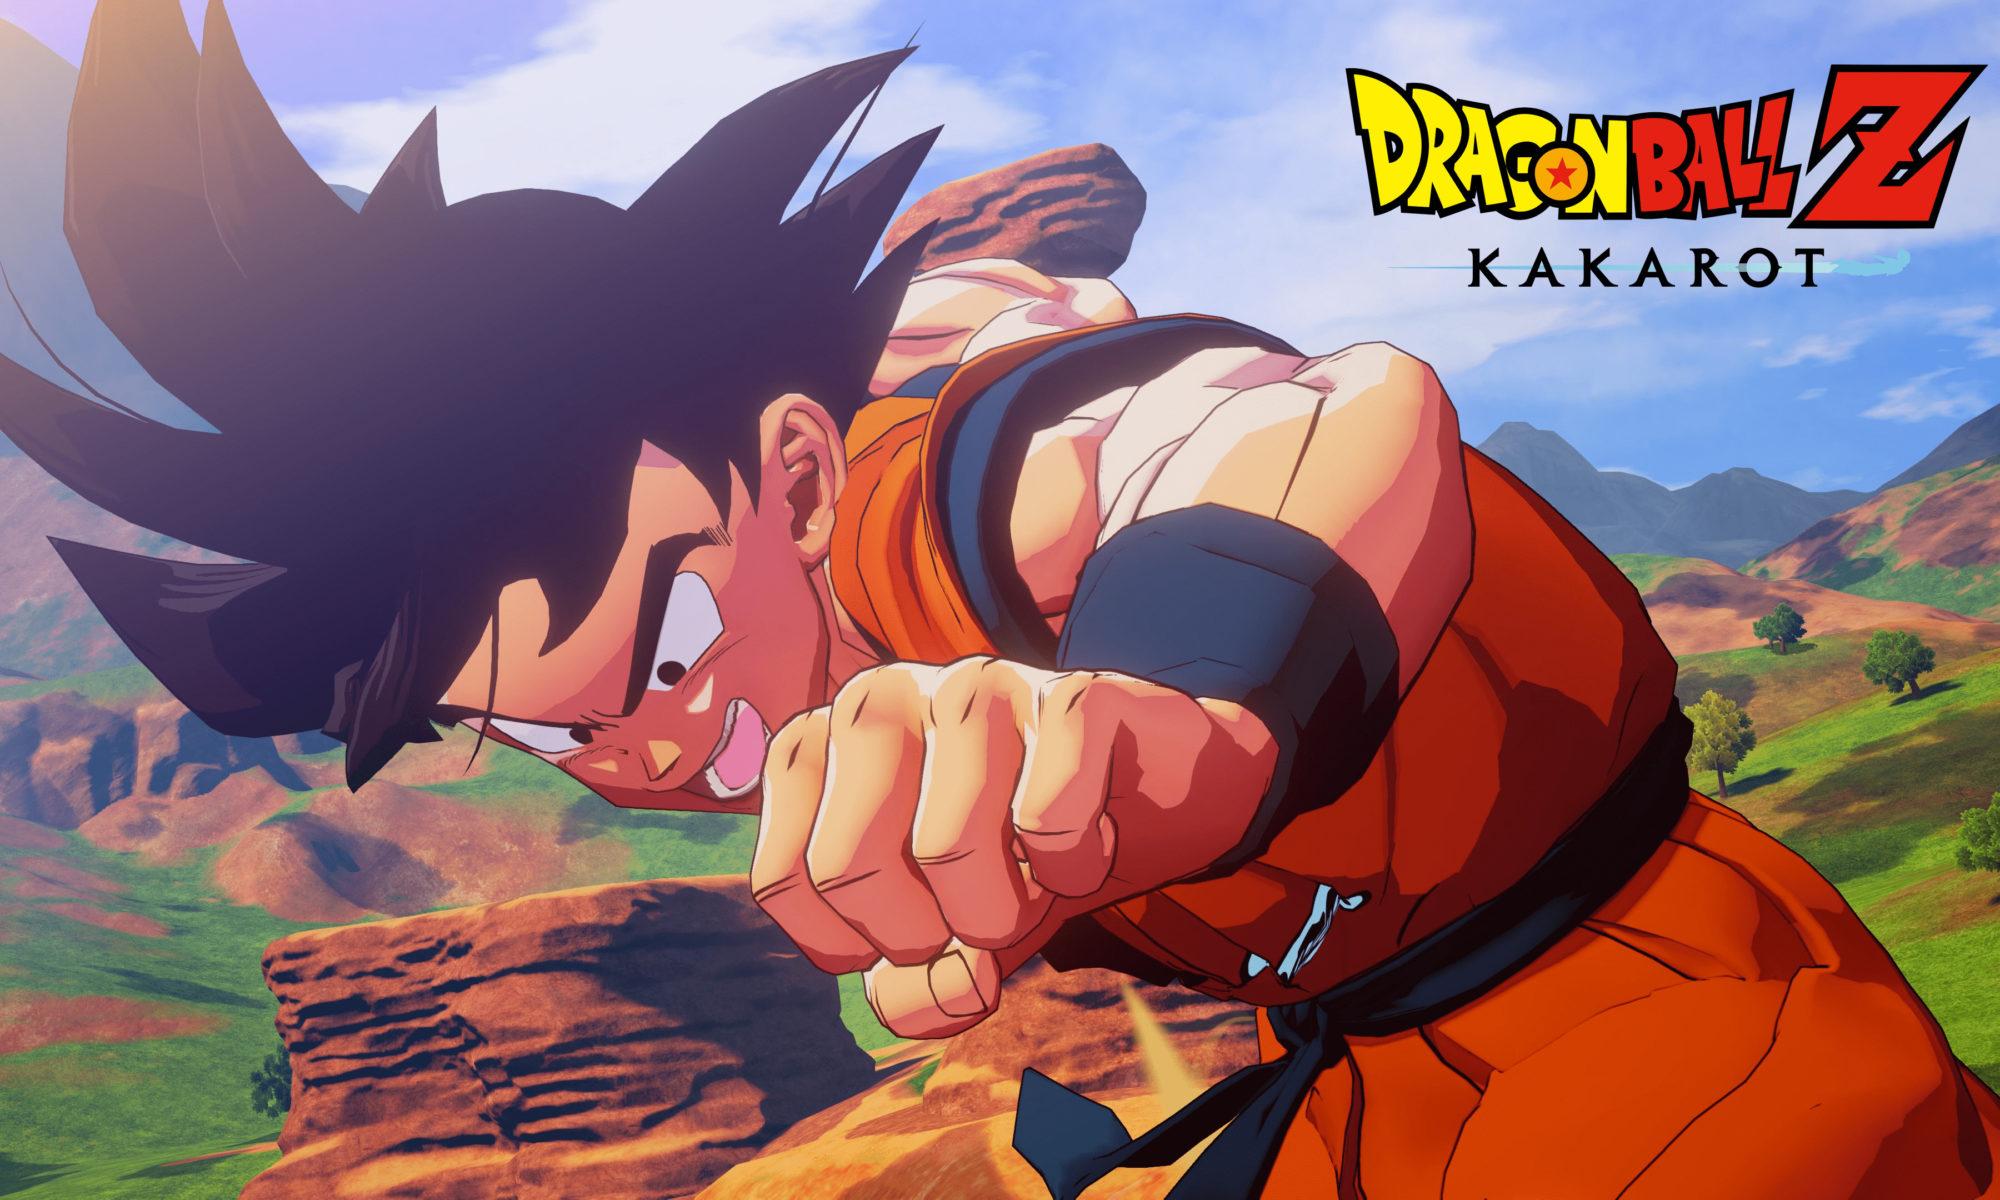 Dragon Ball Z Kakarot trailer